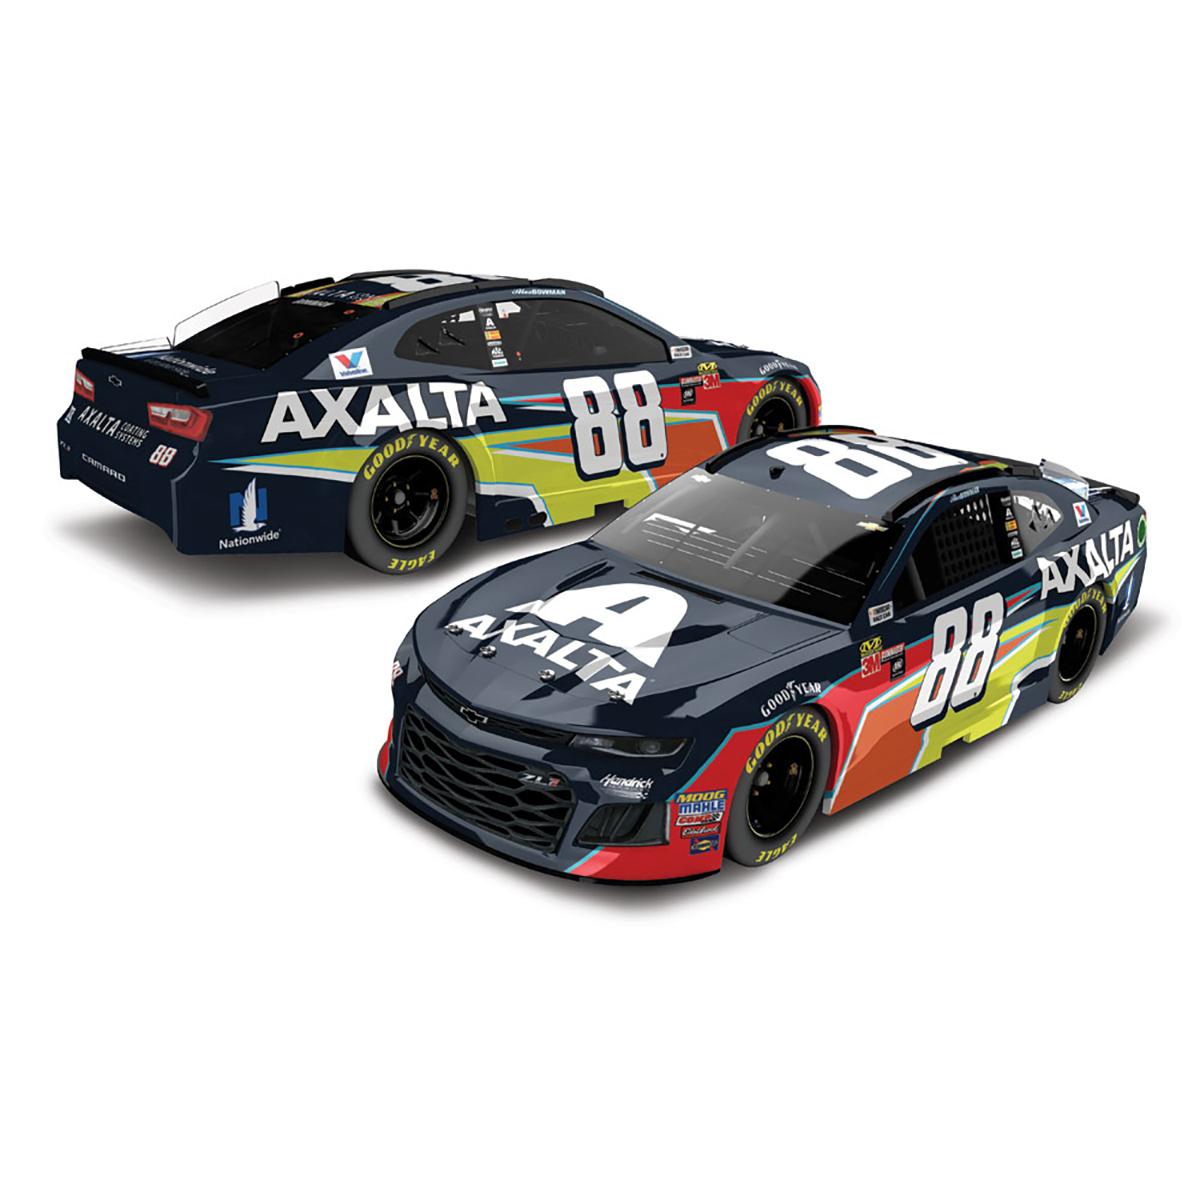 Alex Bowman 2018 NASCAR Cup Series No. 88 Axalta ELITE 1:24 Die-Cast